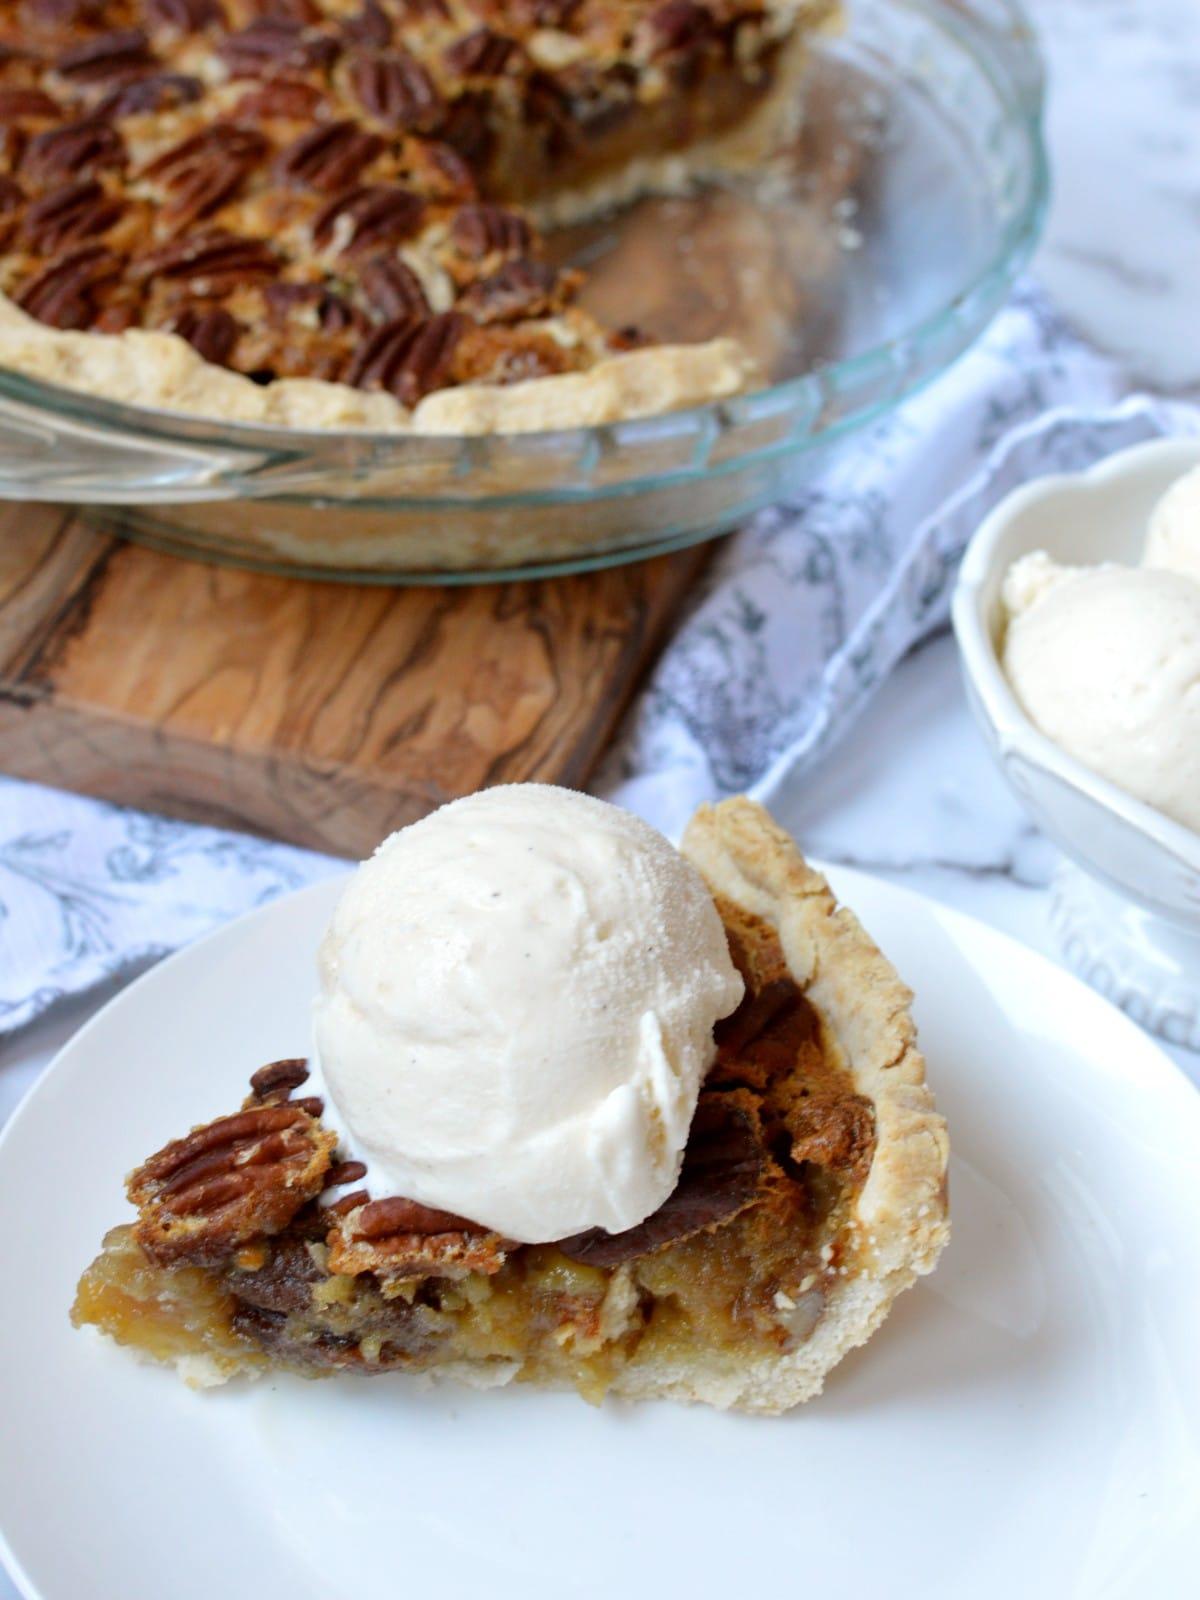 a slice of gluten free pecan pie